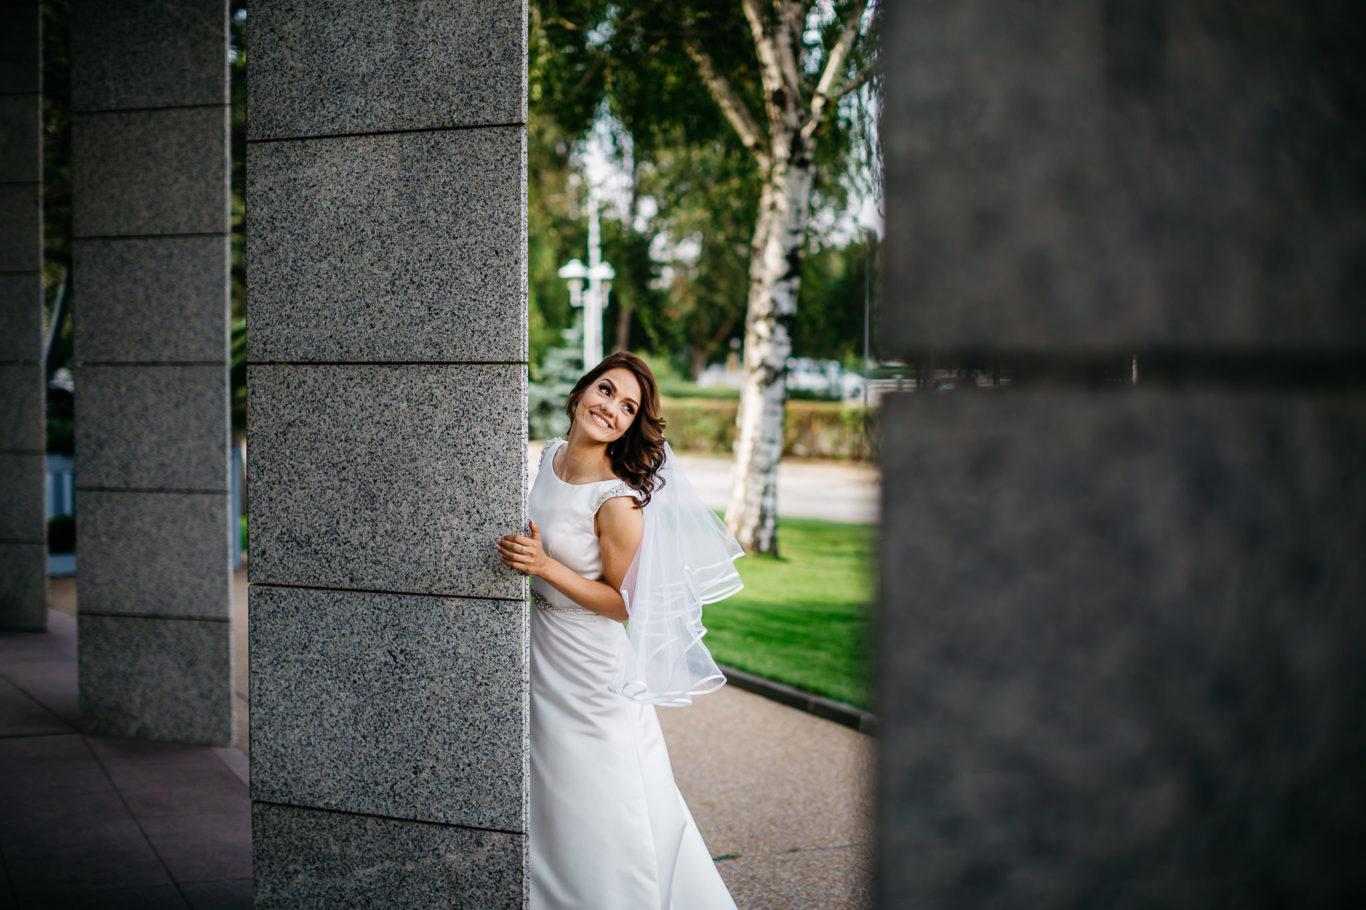 0324-fotografie-nunta-bucuresti-dana-radu-fotograf-ciprian-dumitrescu-cd2_7043